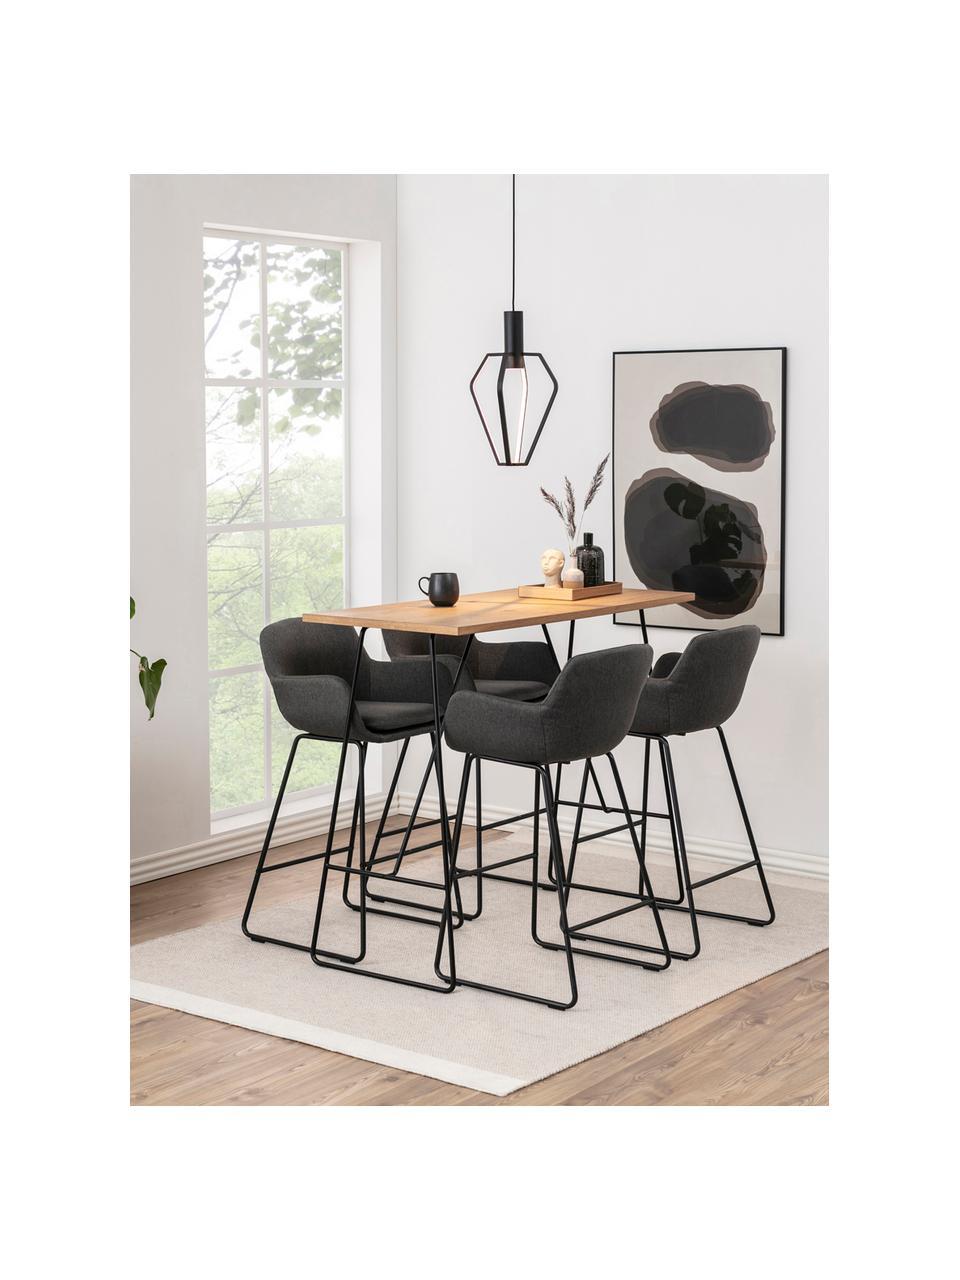 Barstühle Lisa in Grau, 2 Stück, Bezug: Polyester, Gestell: Metall, pulverbeschichtet, Dunkelgrau, Schwarz, 52 x 100 cm